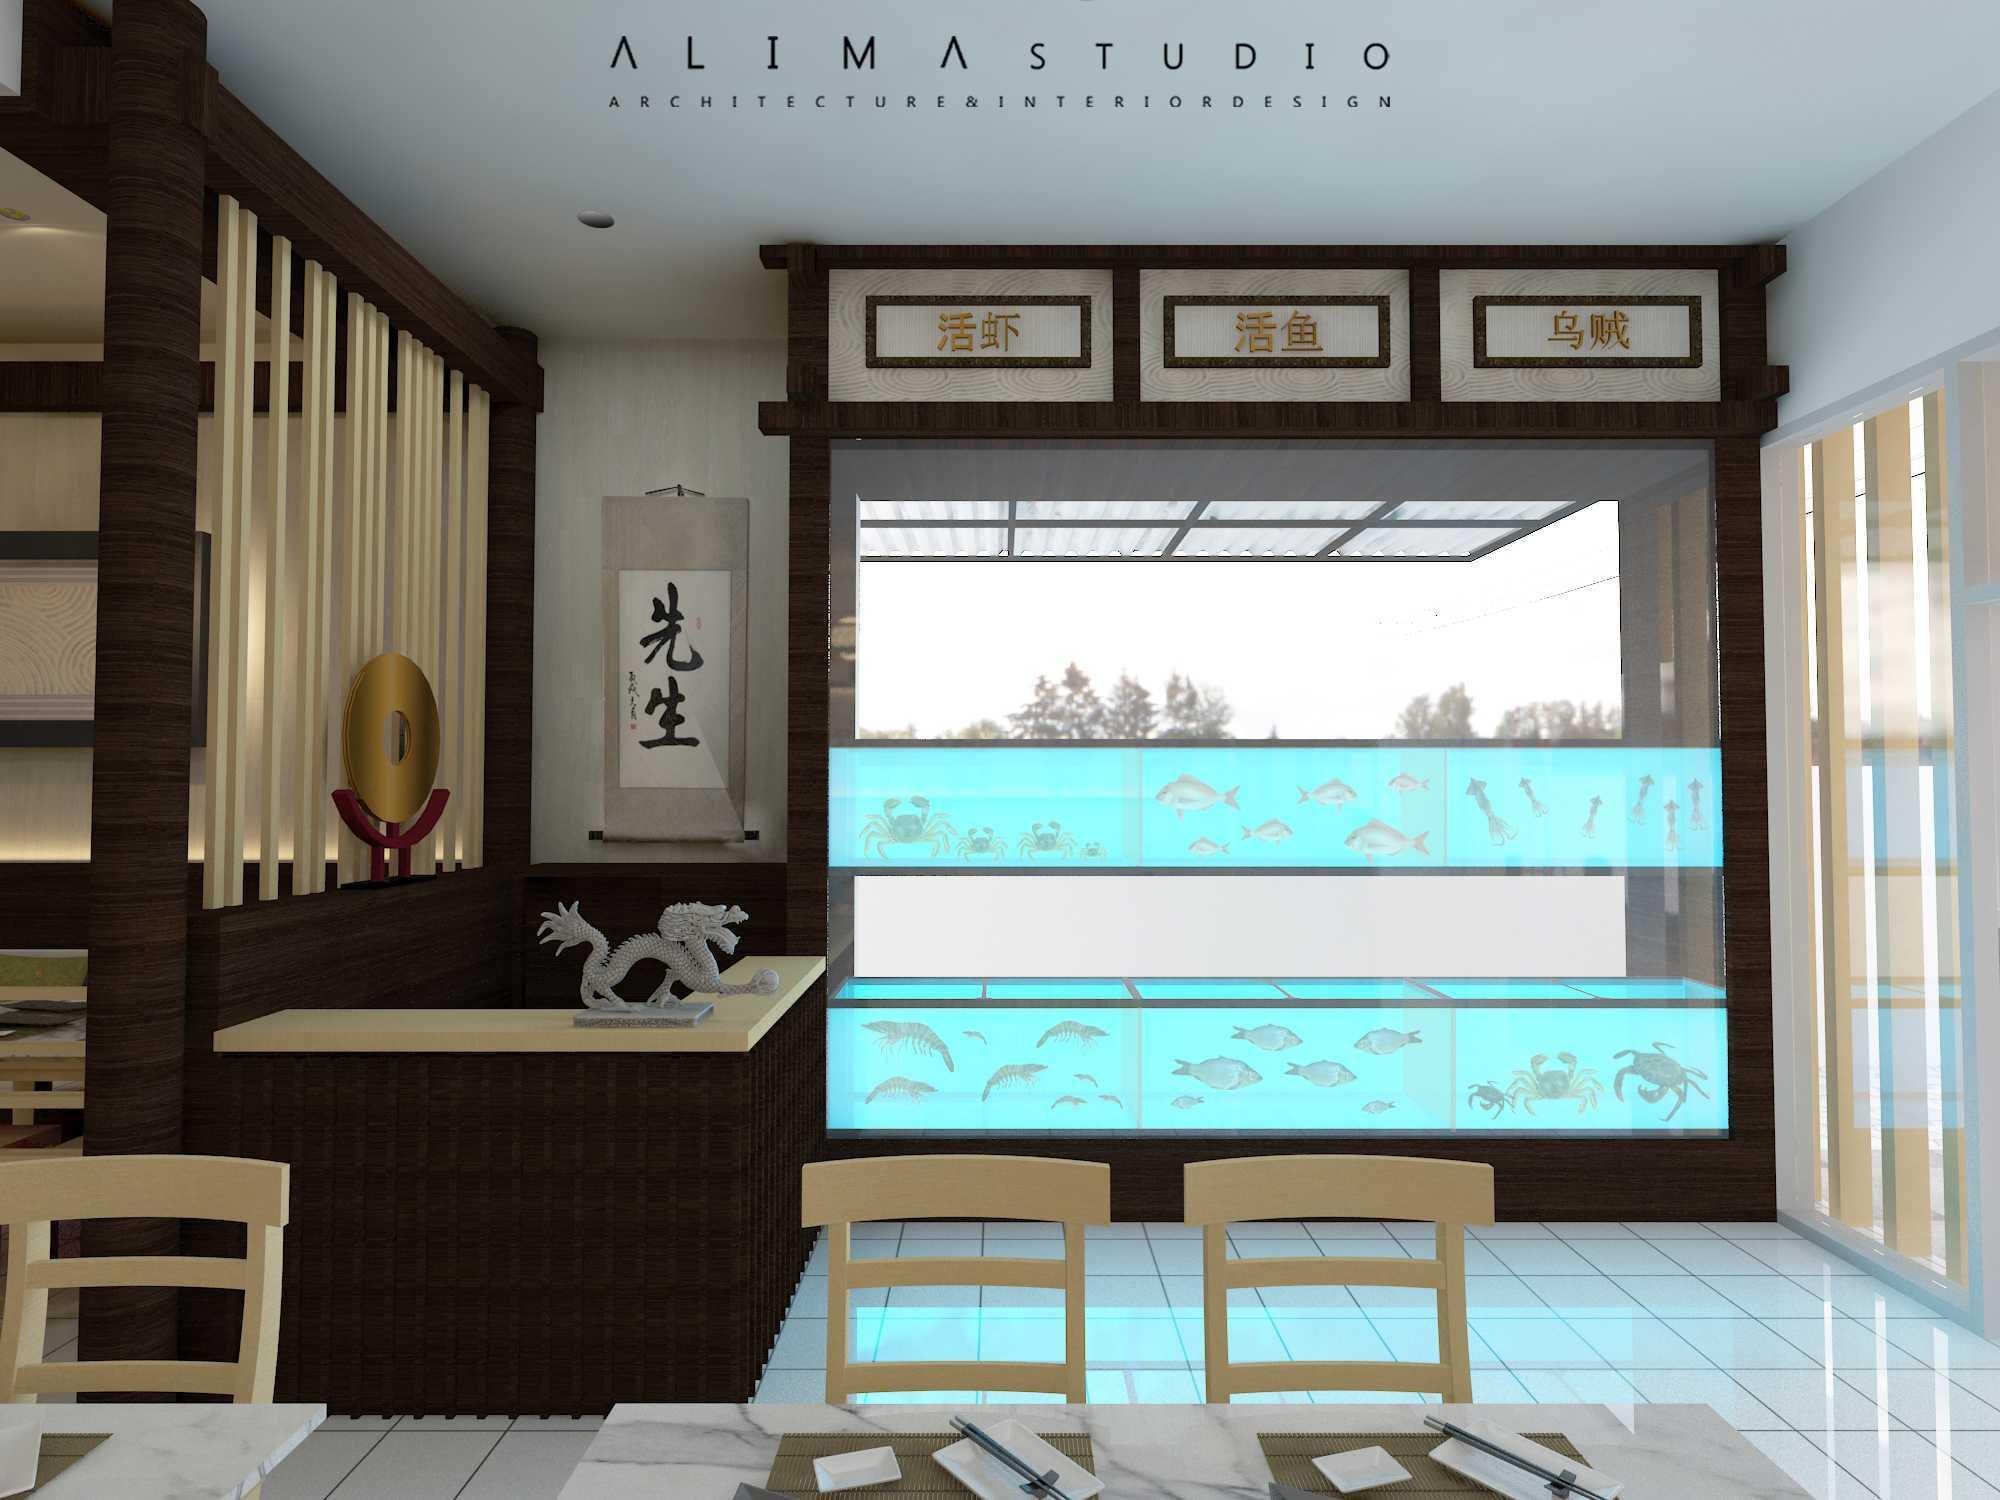 Alima Studio Uncle Chong Restaurant Jl. By Pass Ngurah Rai No.402, Sanur, Denpasar Sel., Bali, 80228, Indonesia Jl. By Pass Ngurah Rai No.402, Sanur, Denpasar Sel., Bali, 80228, Indonesia Alima-Studio-Uncle-Chong-Restaurant Asian  61860